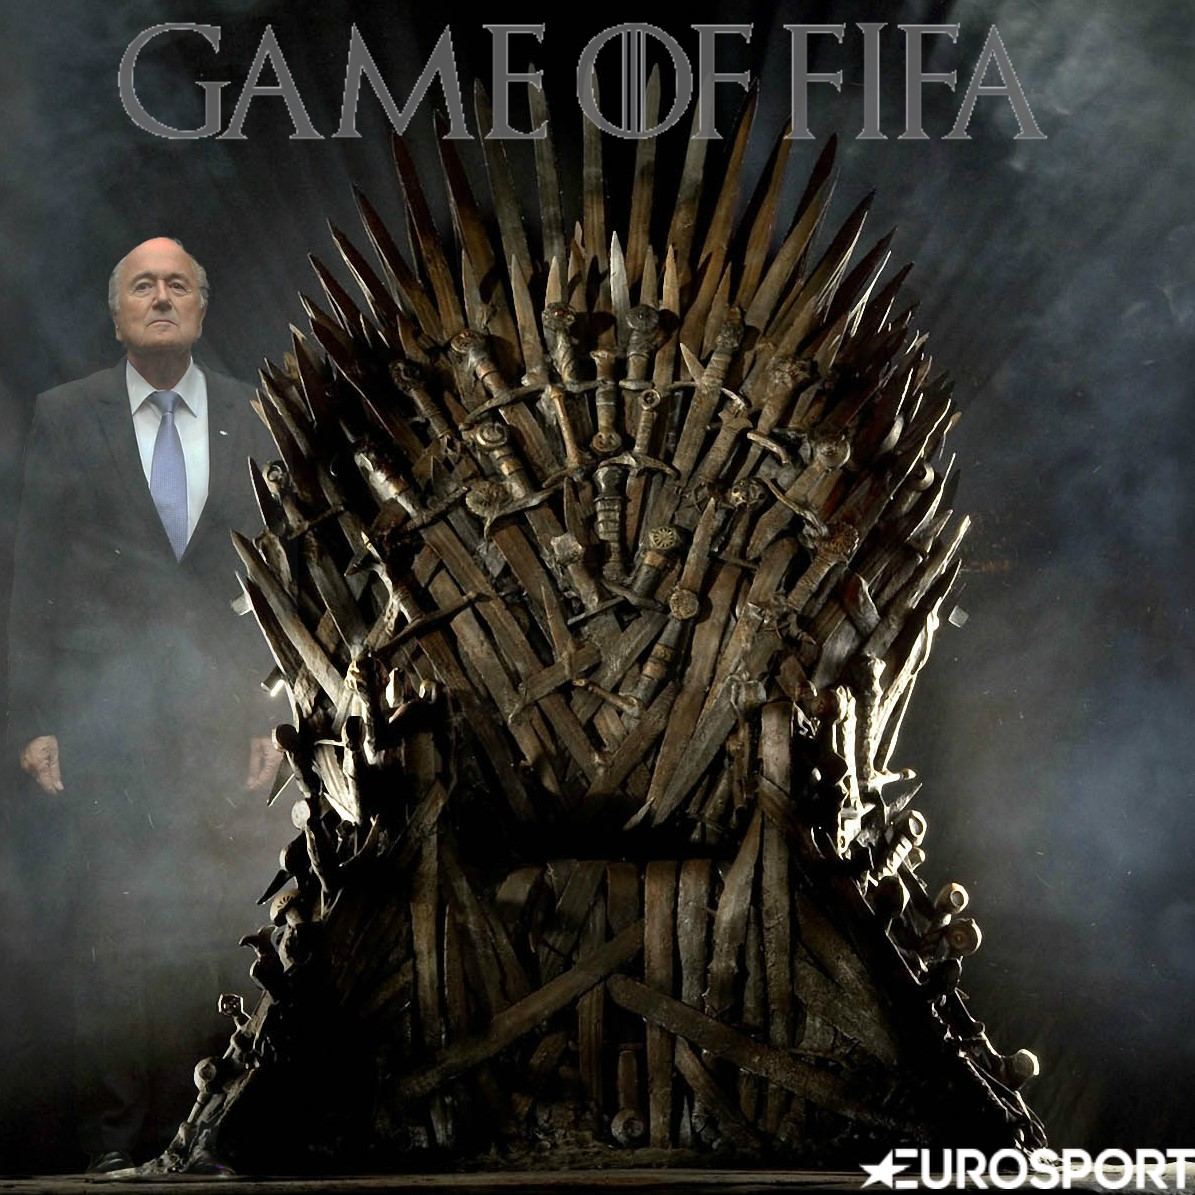 Visuel Game of FIFA Blatter